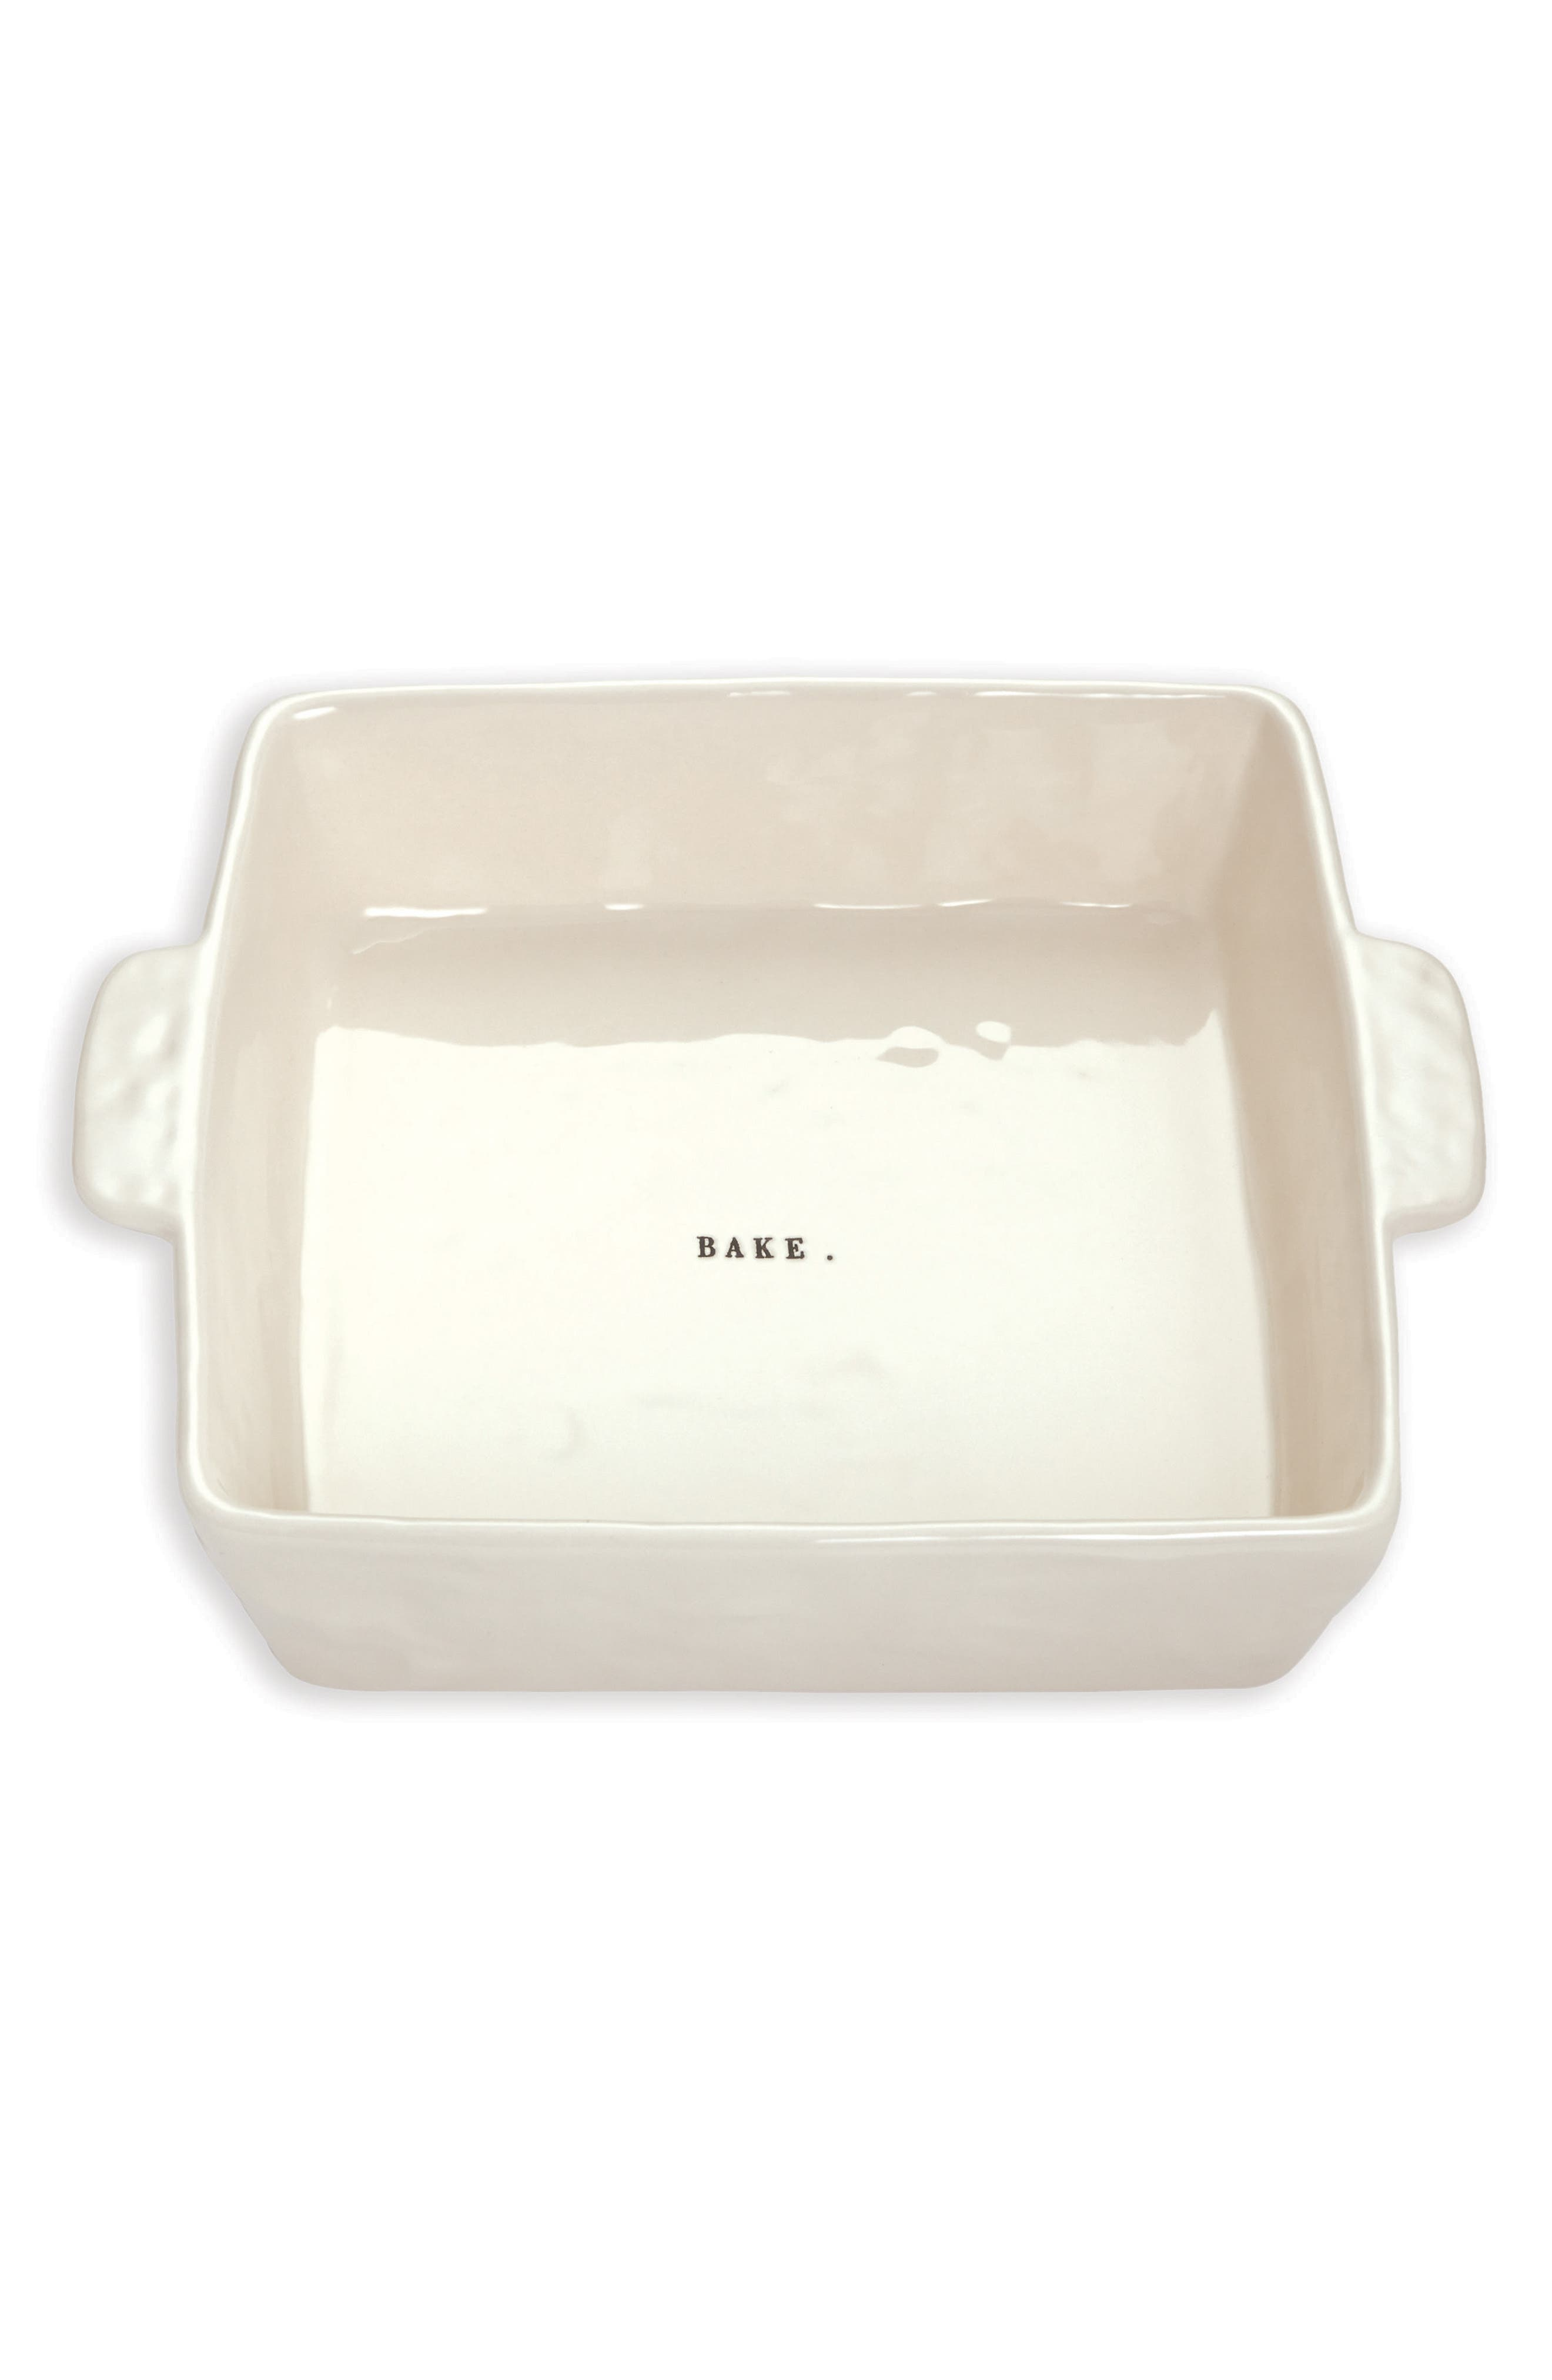 Ceramic Bake Dish,                         Main,                         color, 100